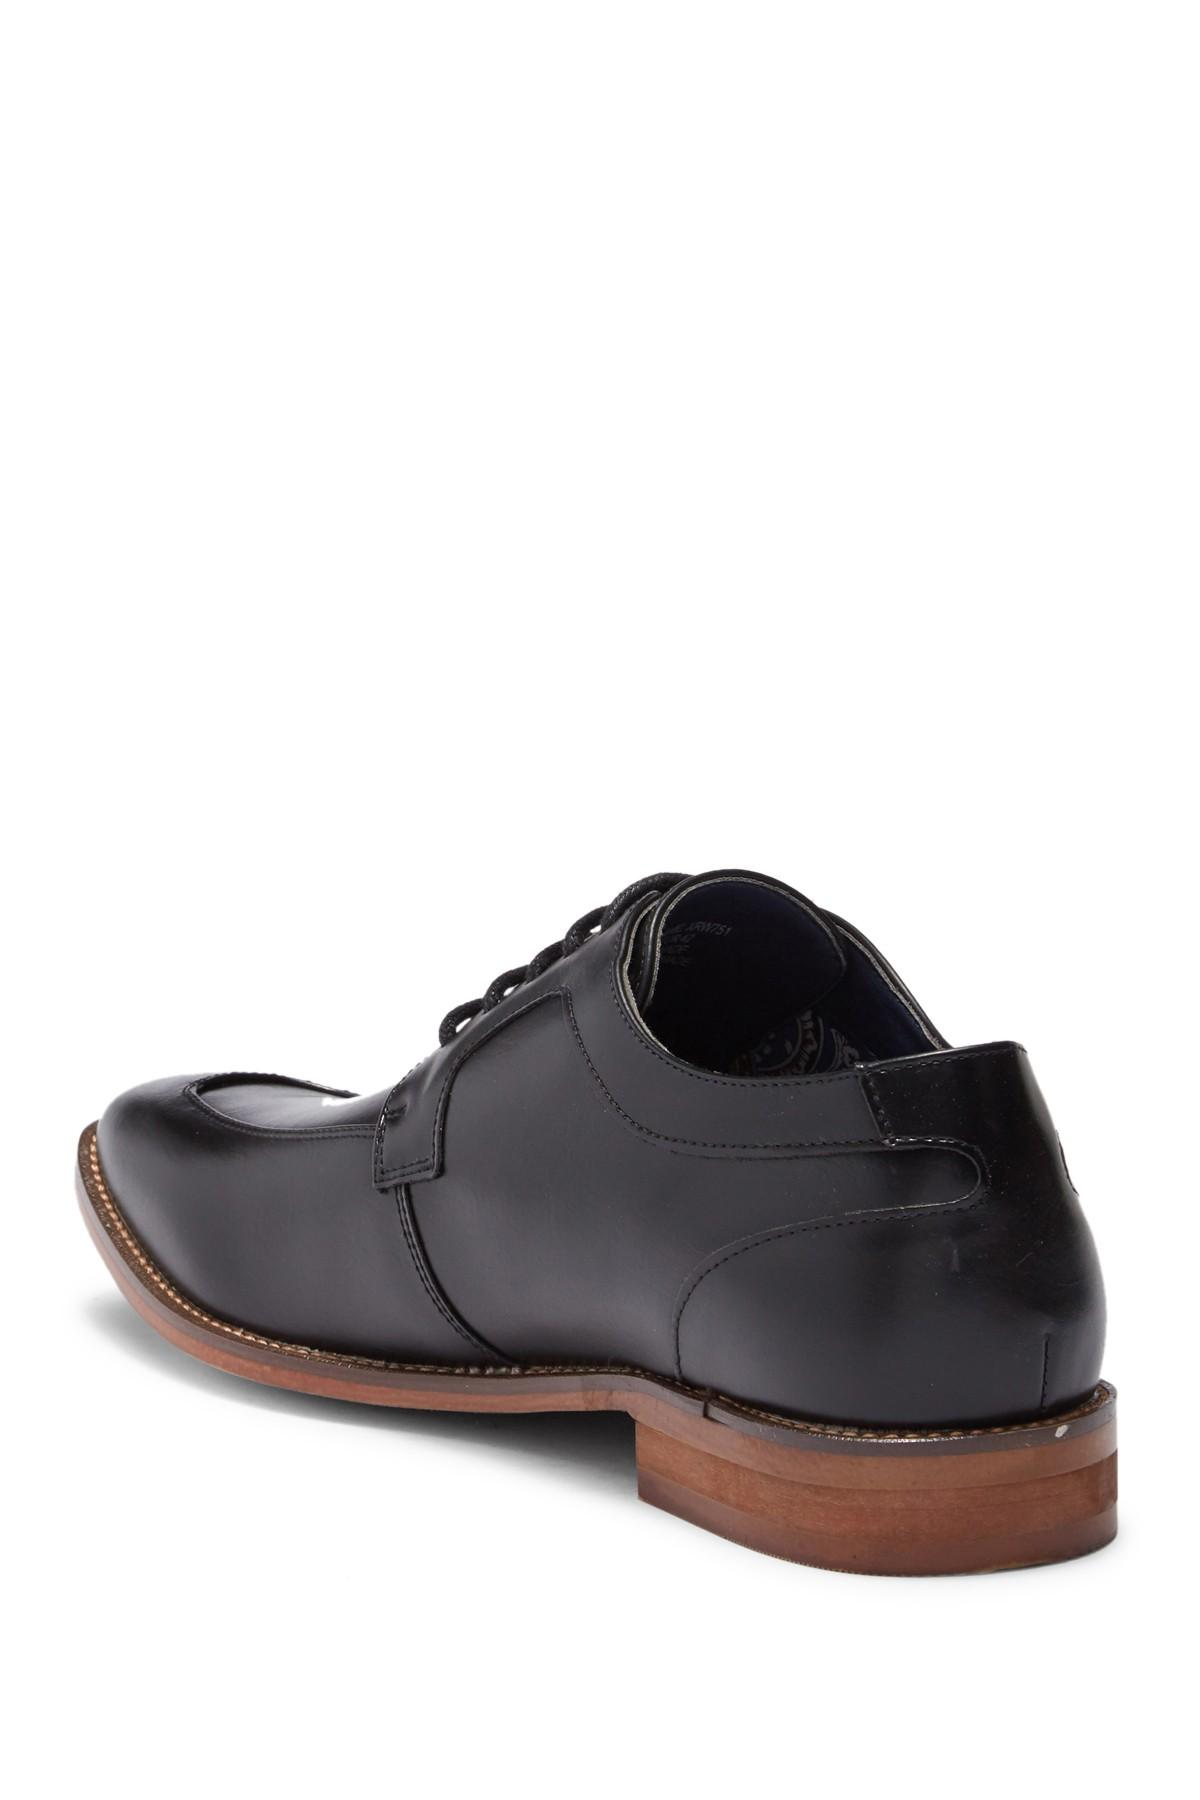 69b837aea65 Lyst - Xray Jeans The Giutso Derby in Black for Men